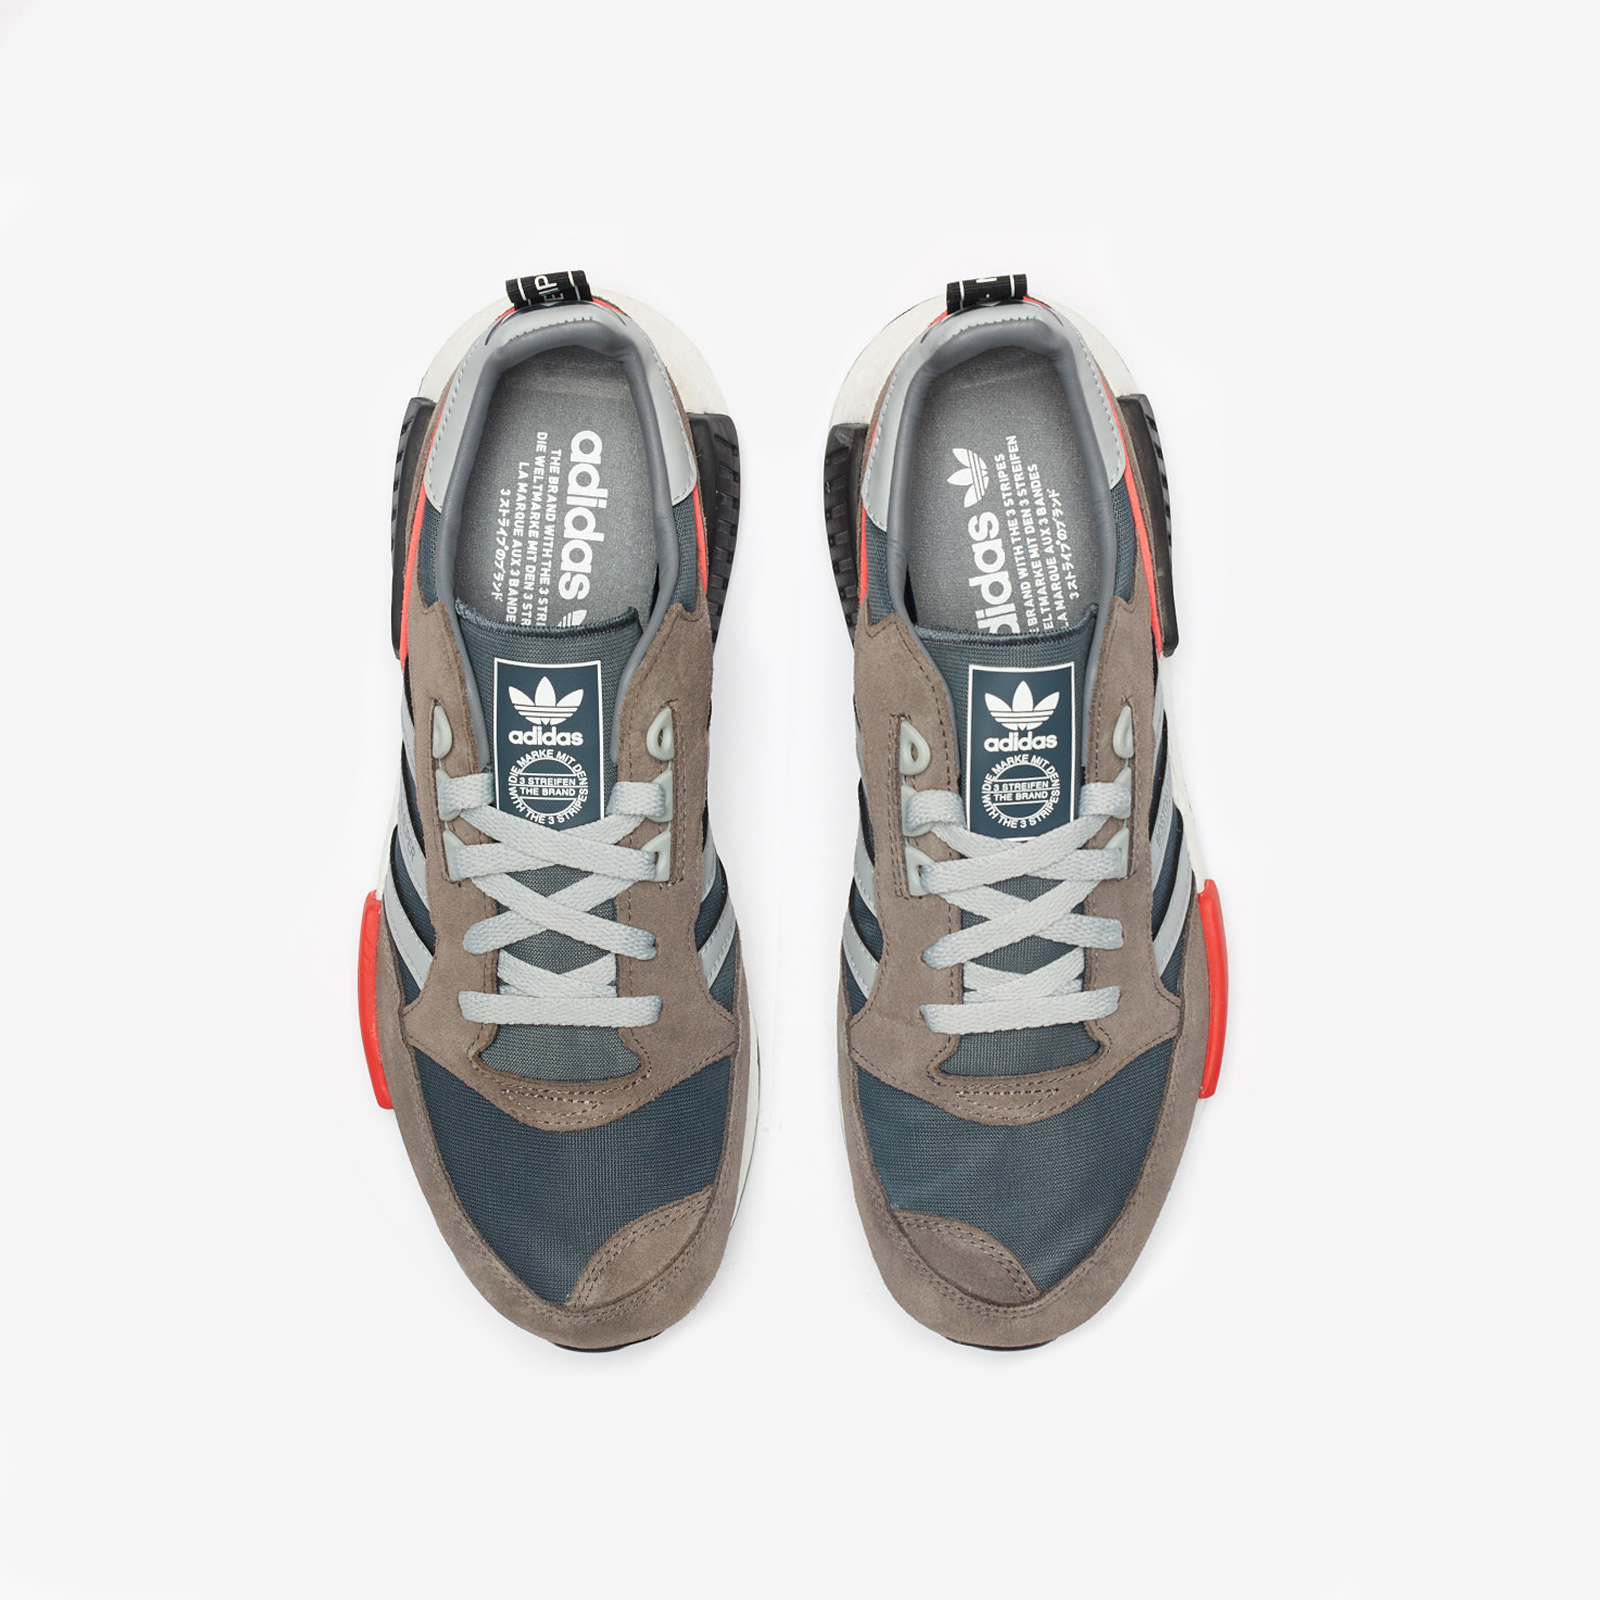 6bca603a31eb adidas Boston Super x R1 - G26776 - Sneakersnstuff